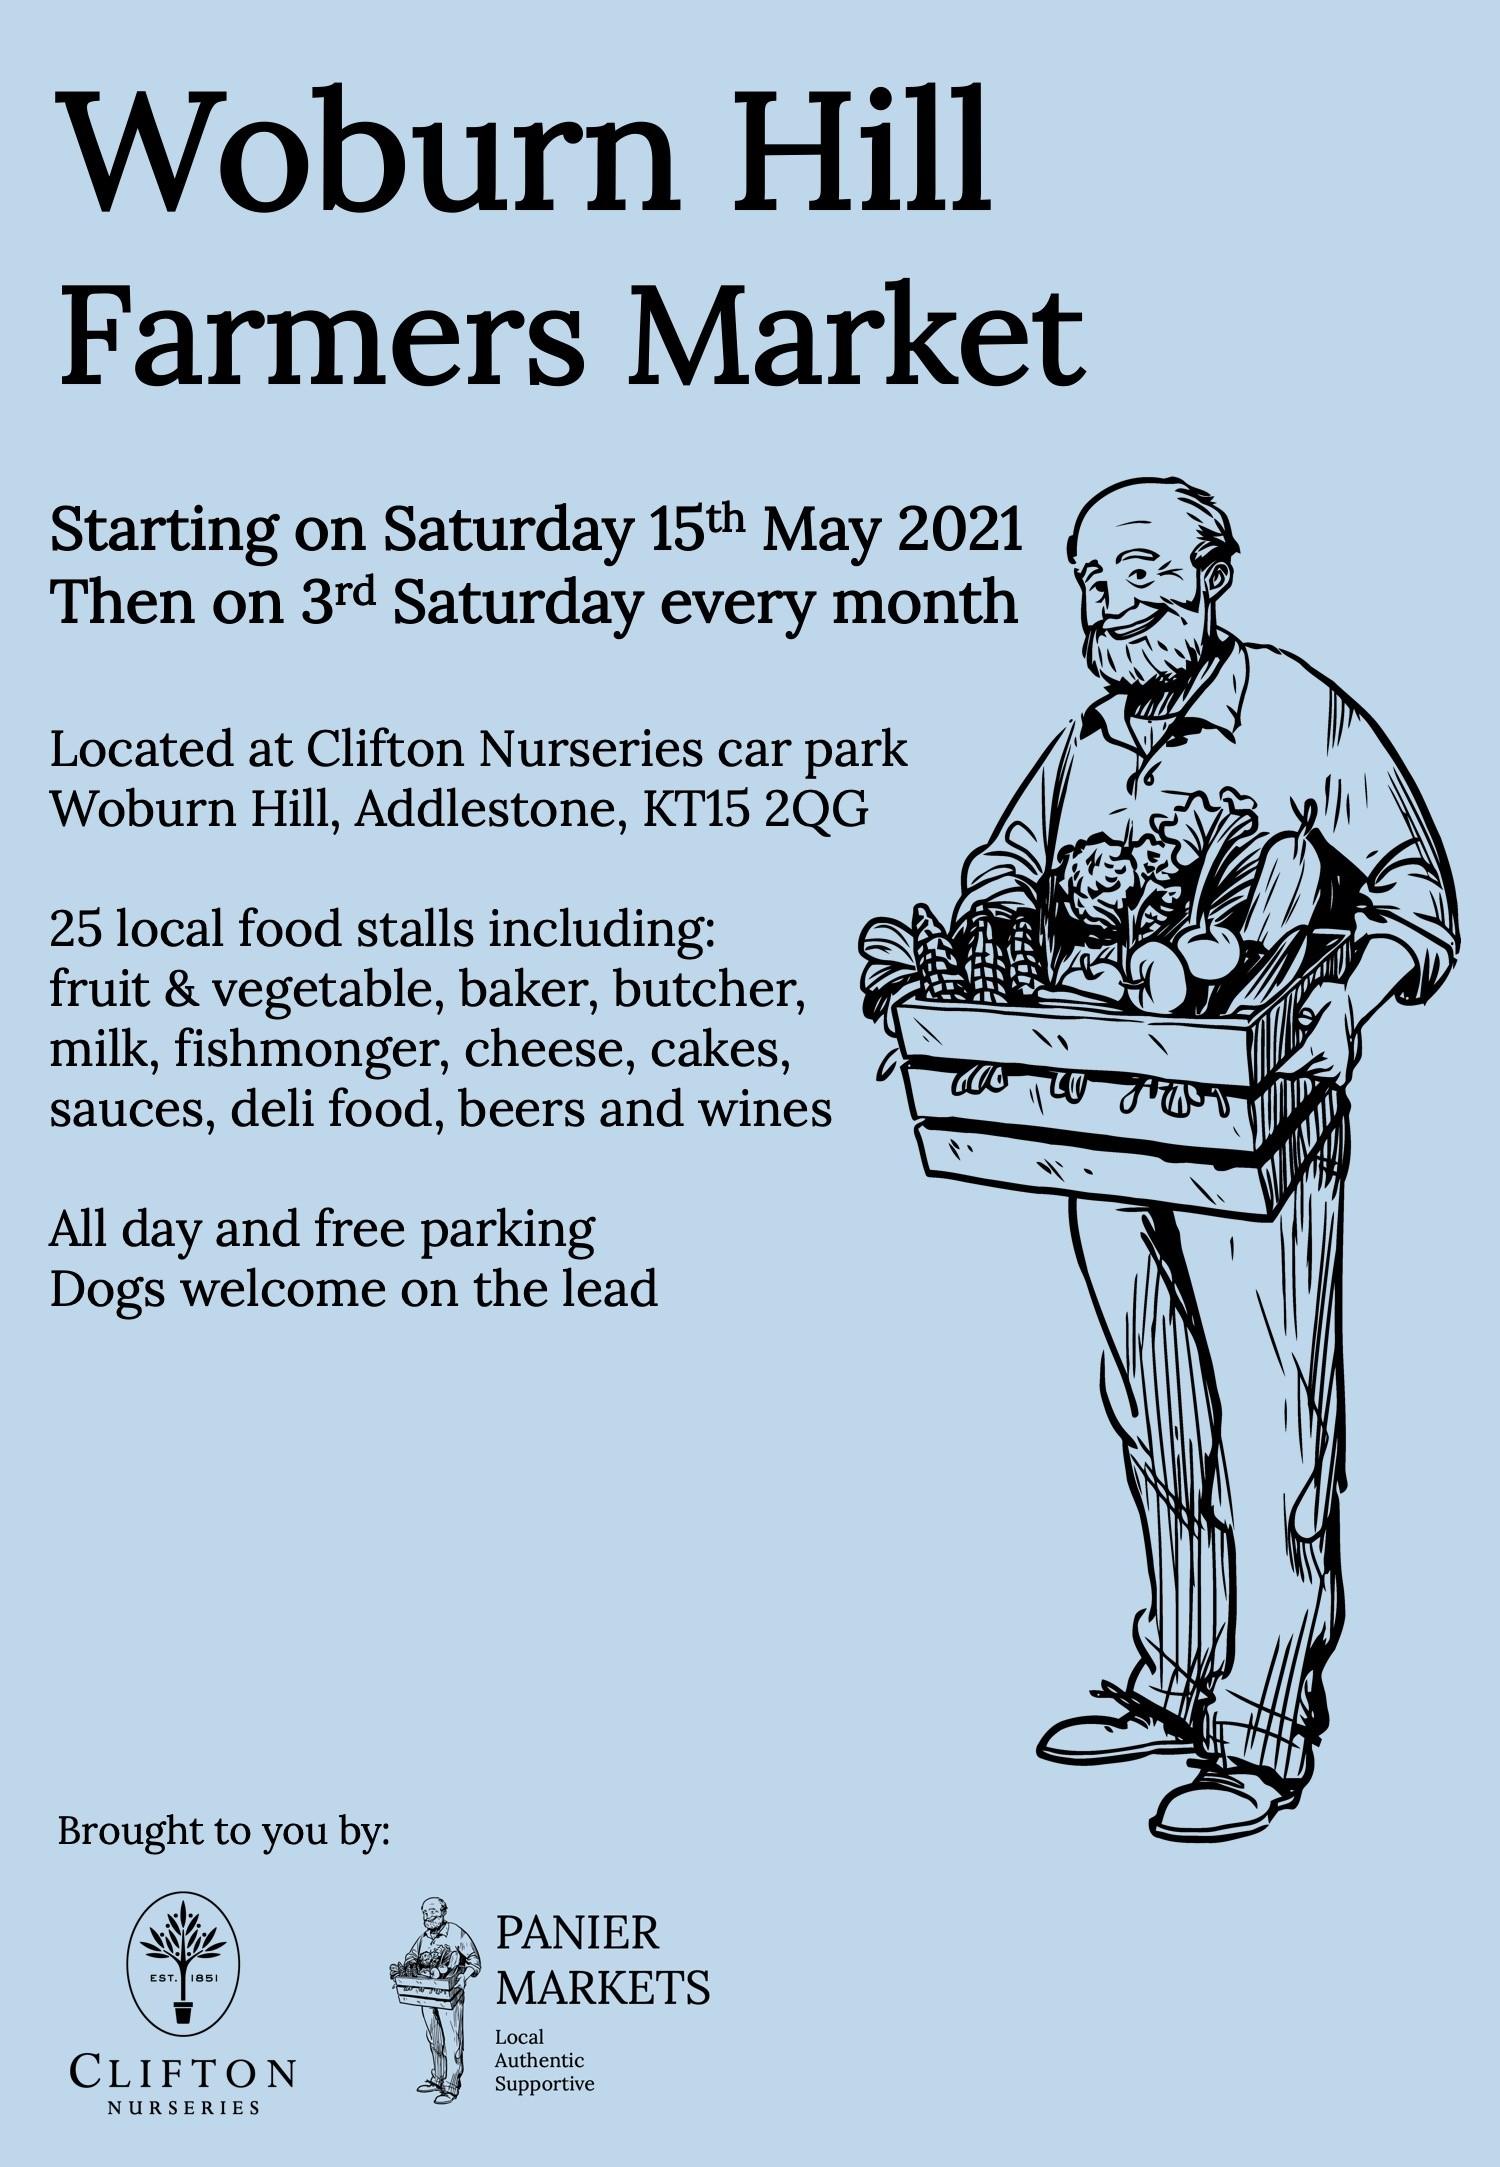 Woburn Hill Farmers Market at Clifton Nurseries Surrey